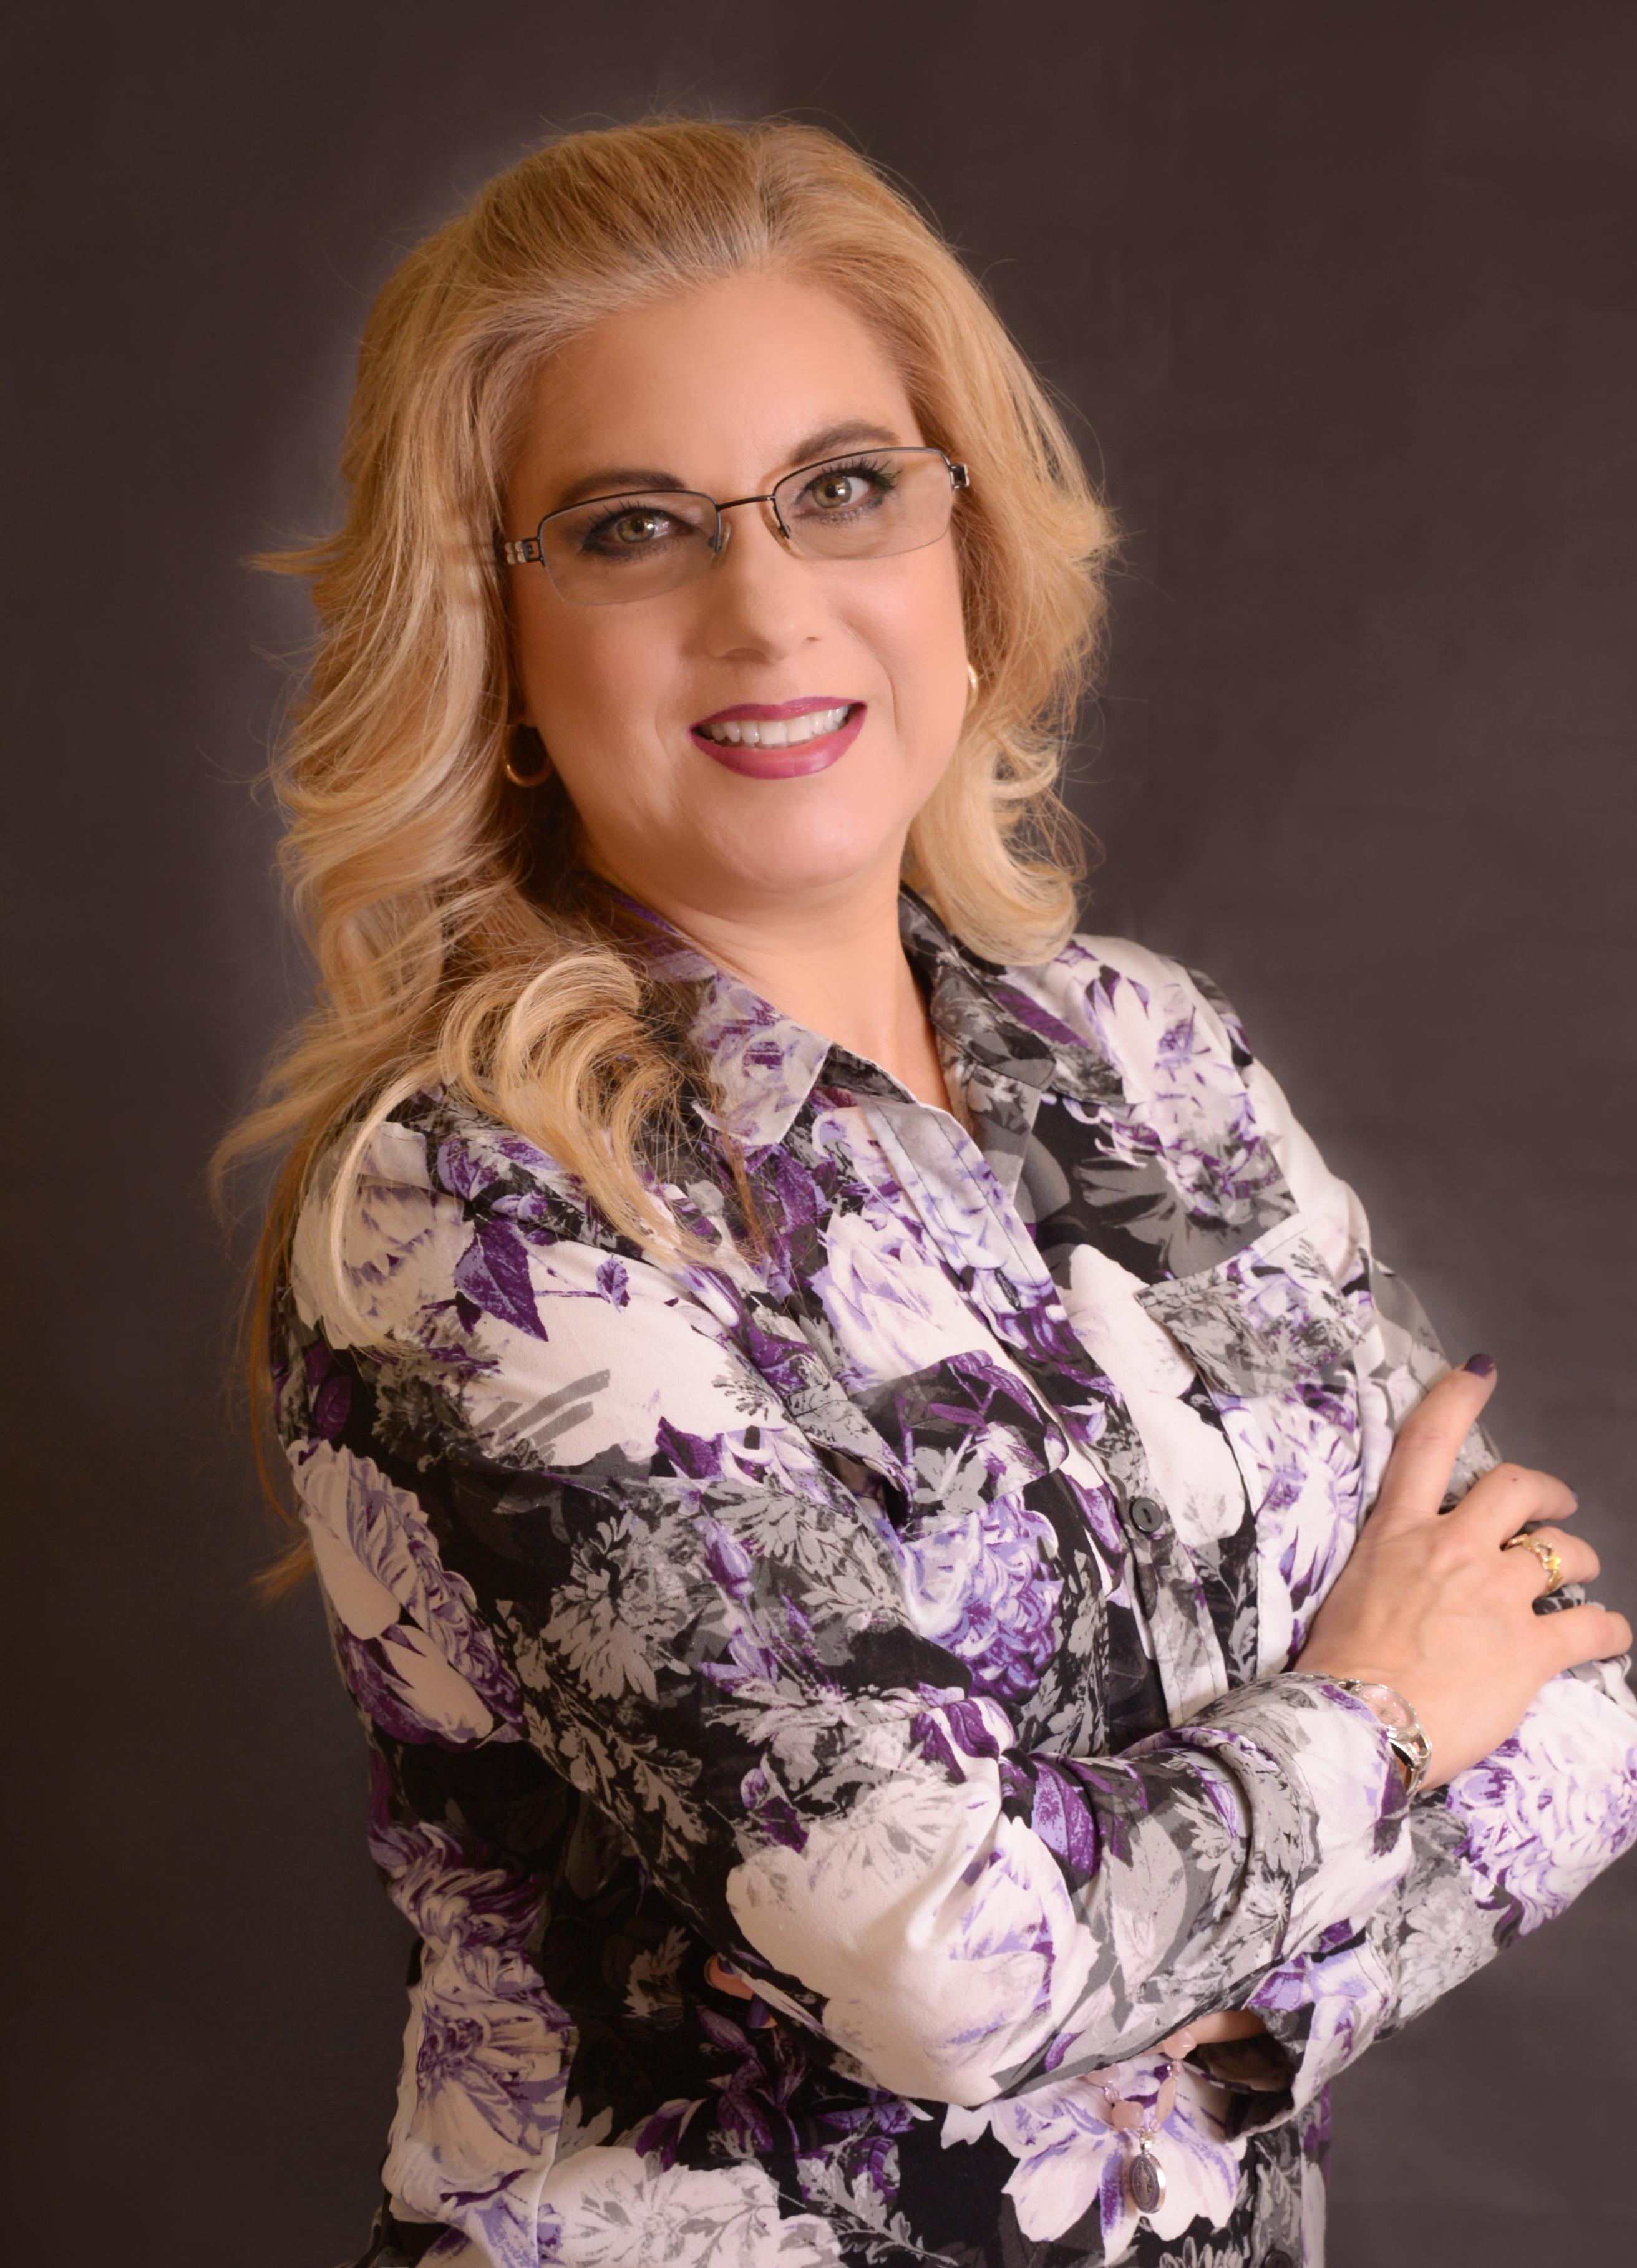 Angela Casiano